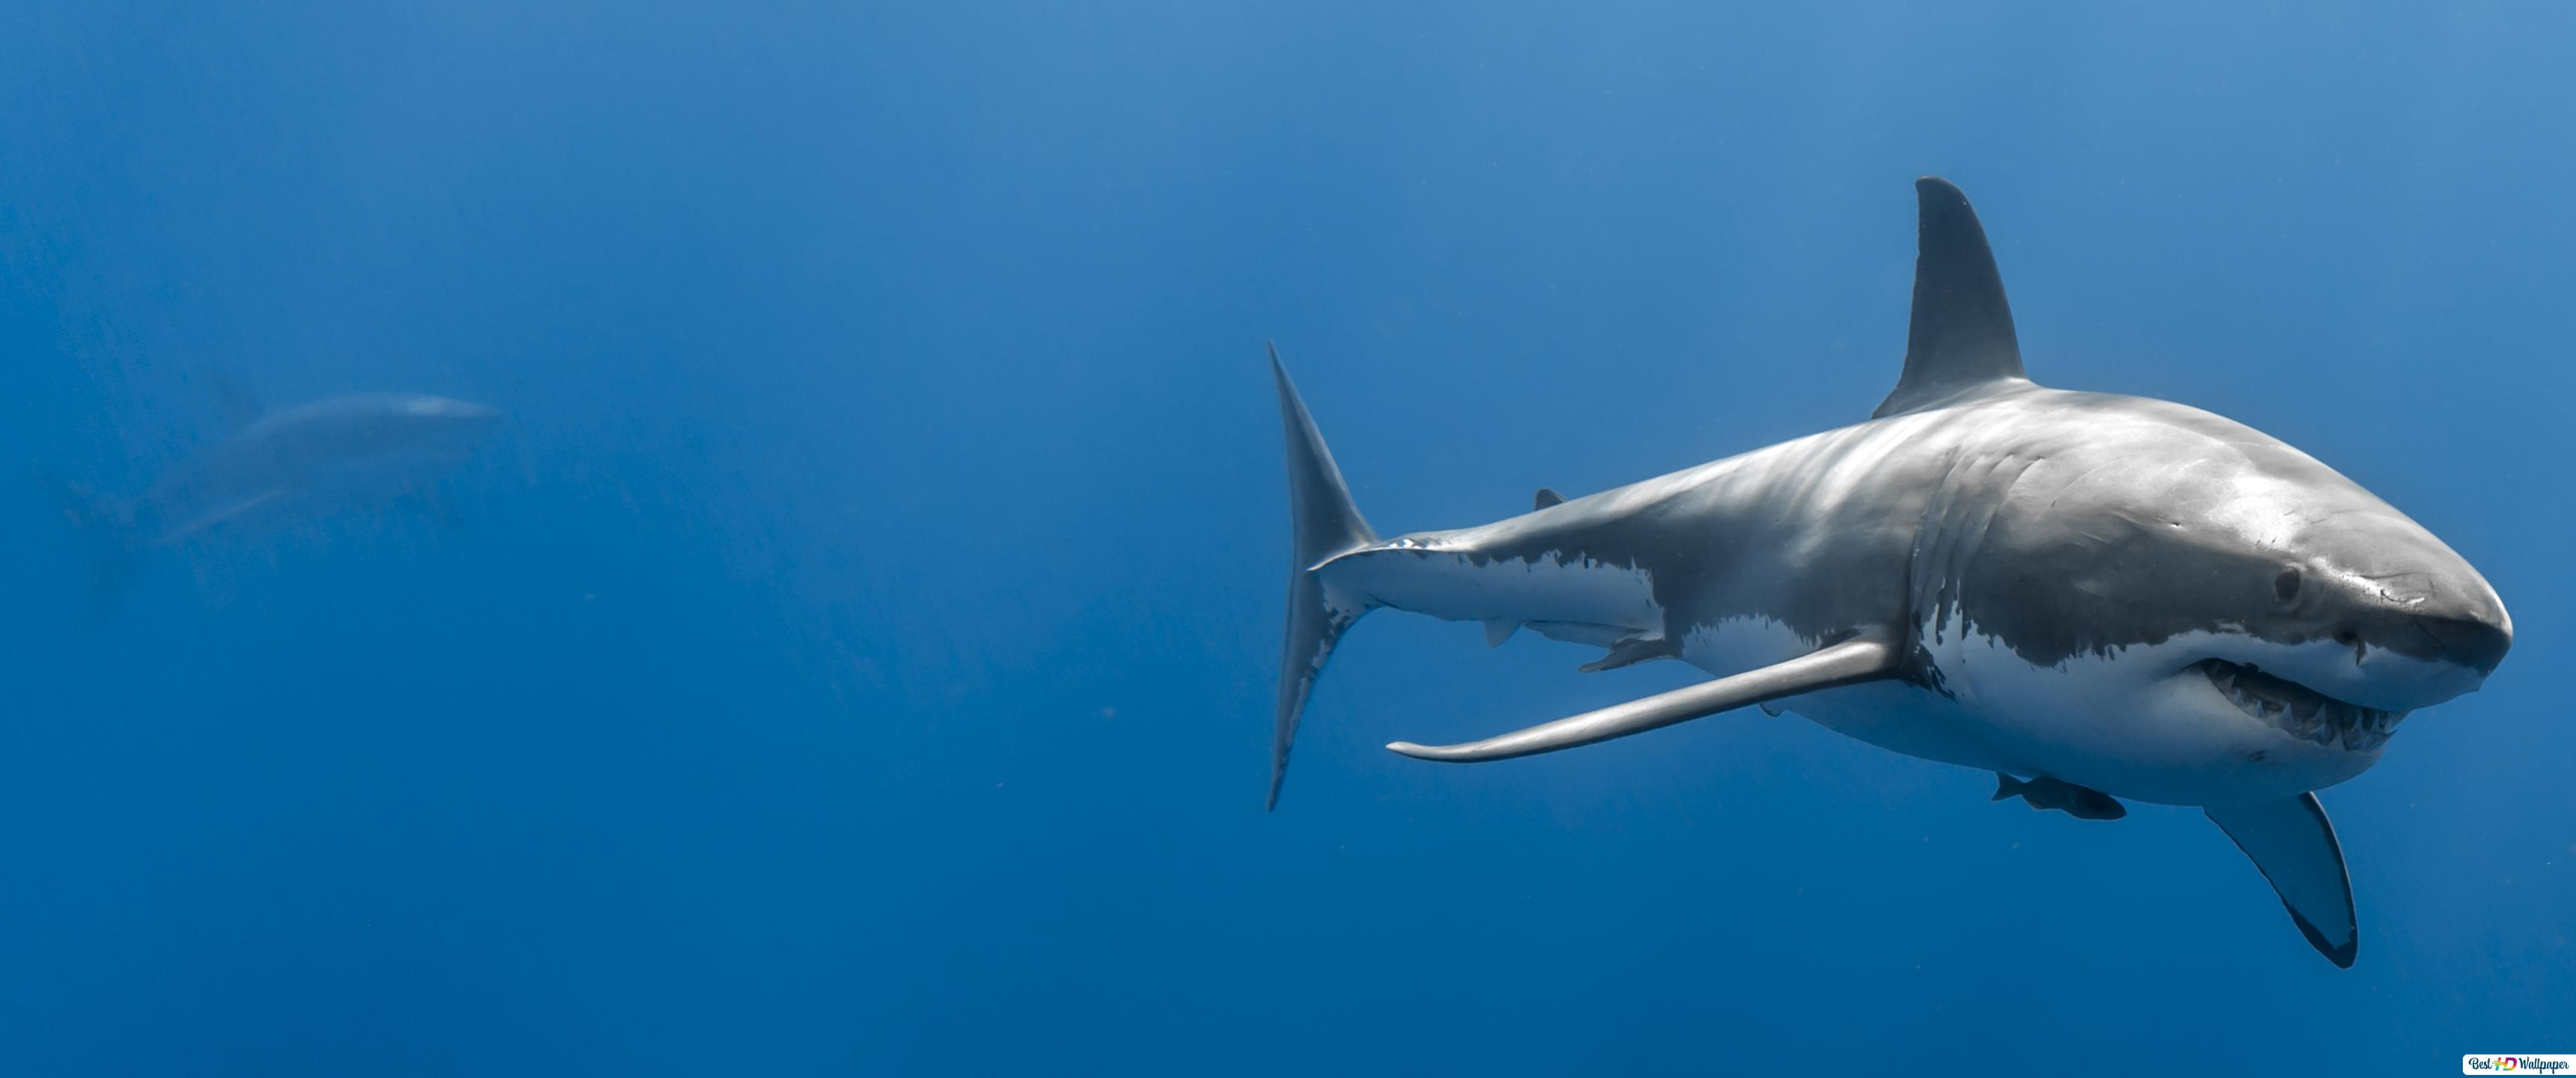 Bull shark wallpaper